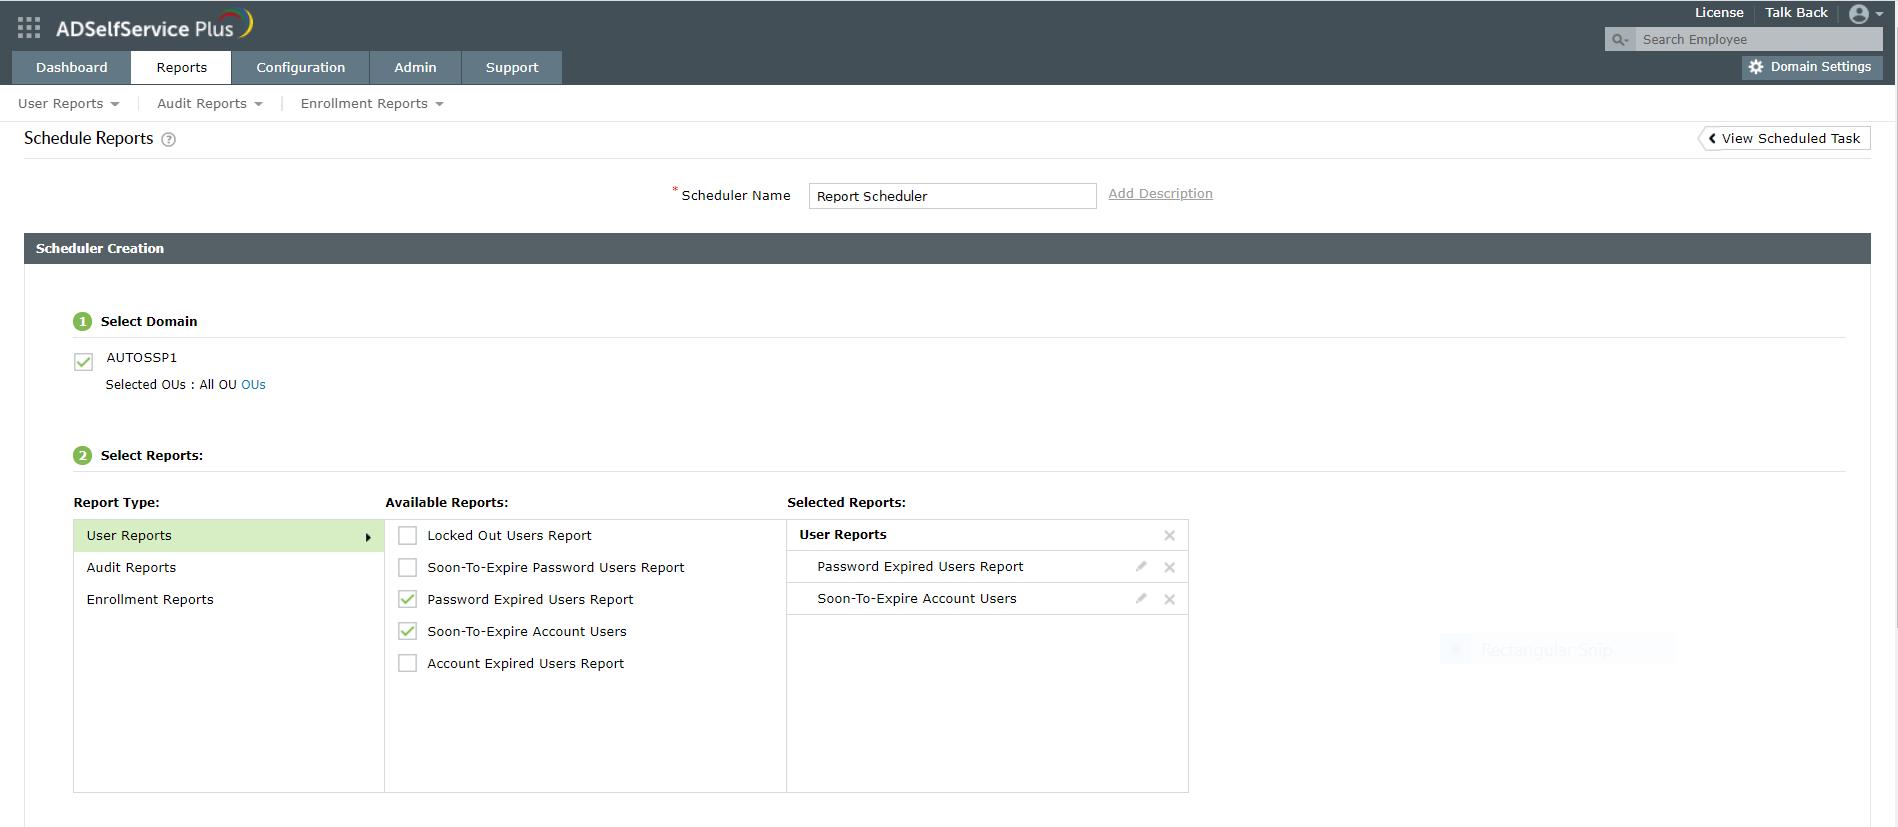 adselfservice-plus-reports-17